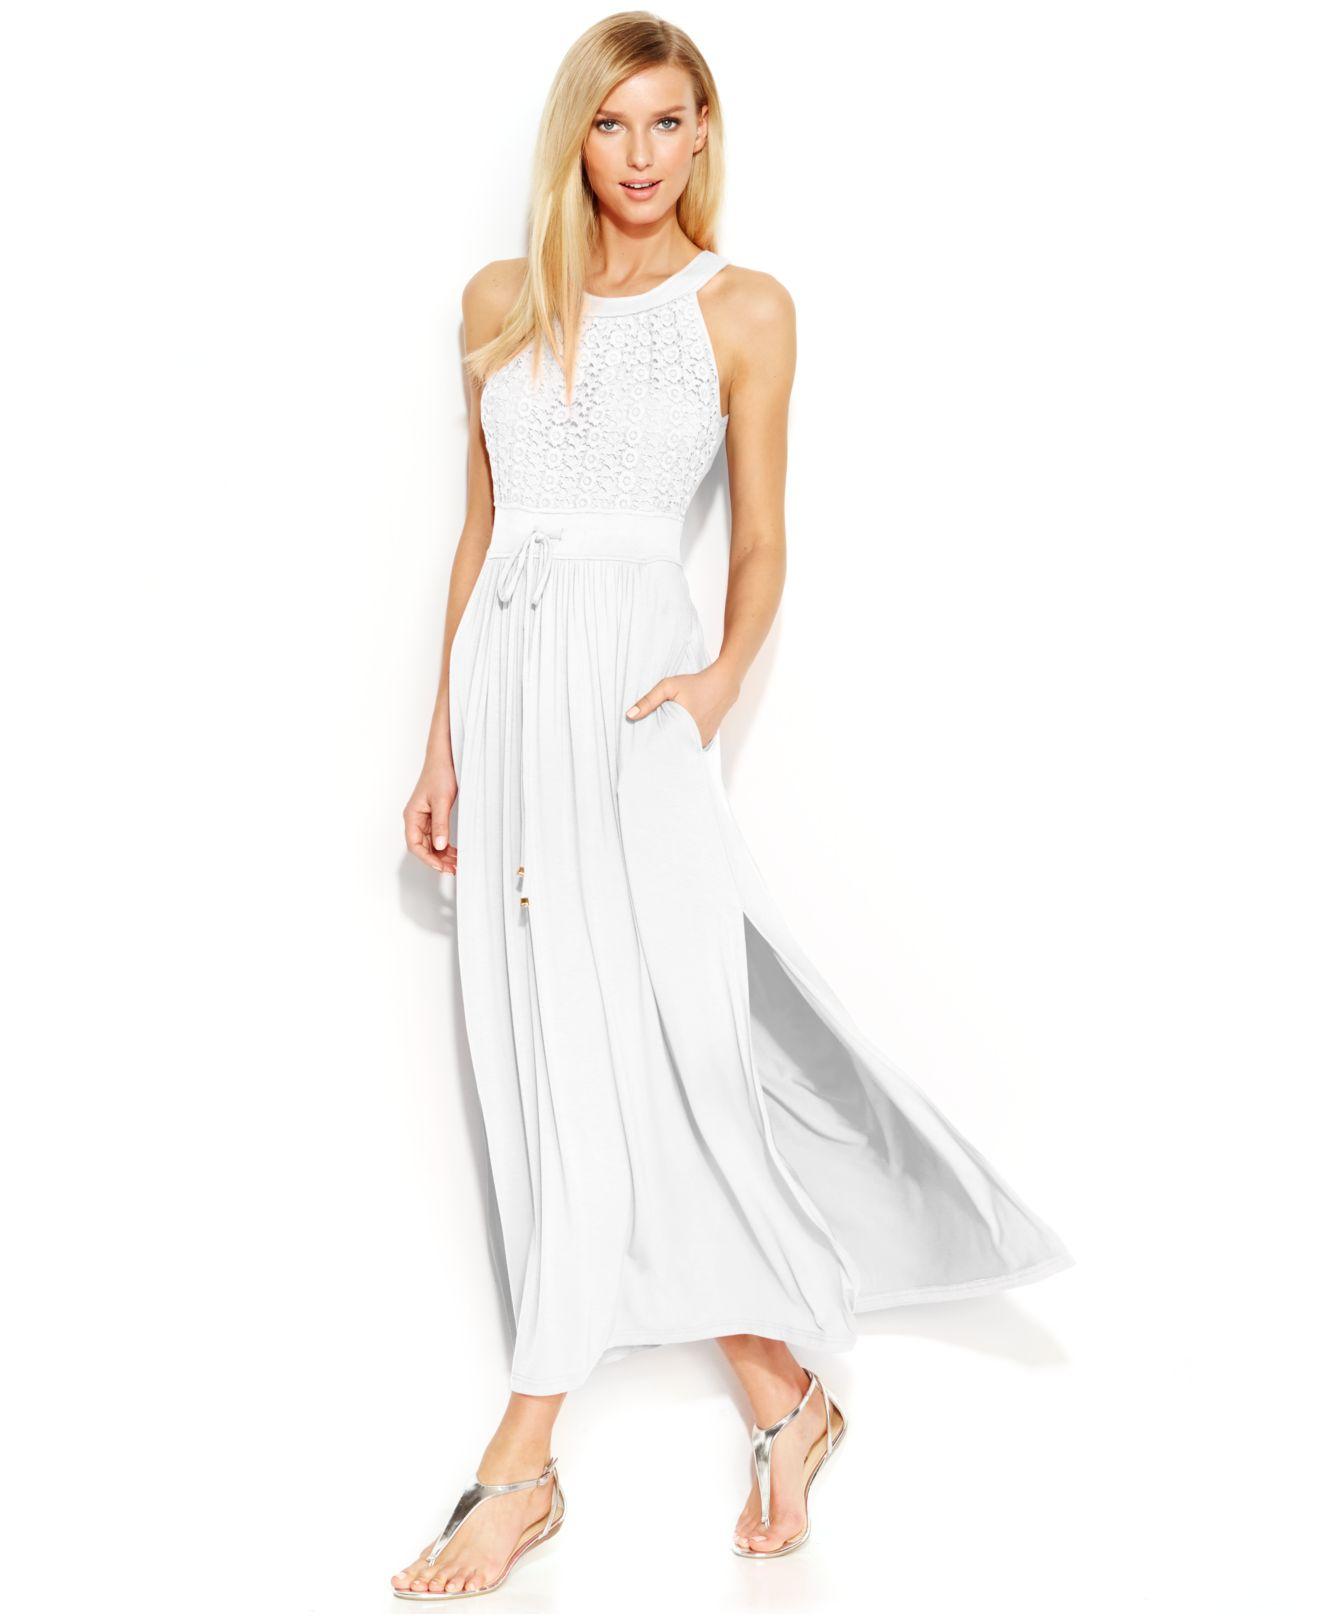 White Side Slit Maxi Dress